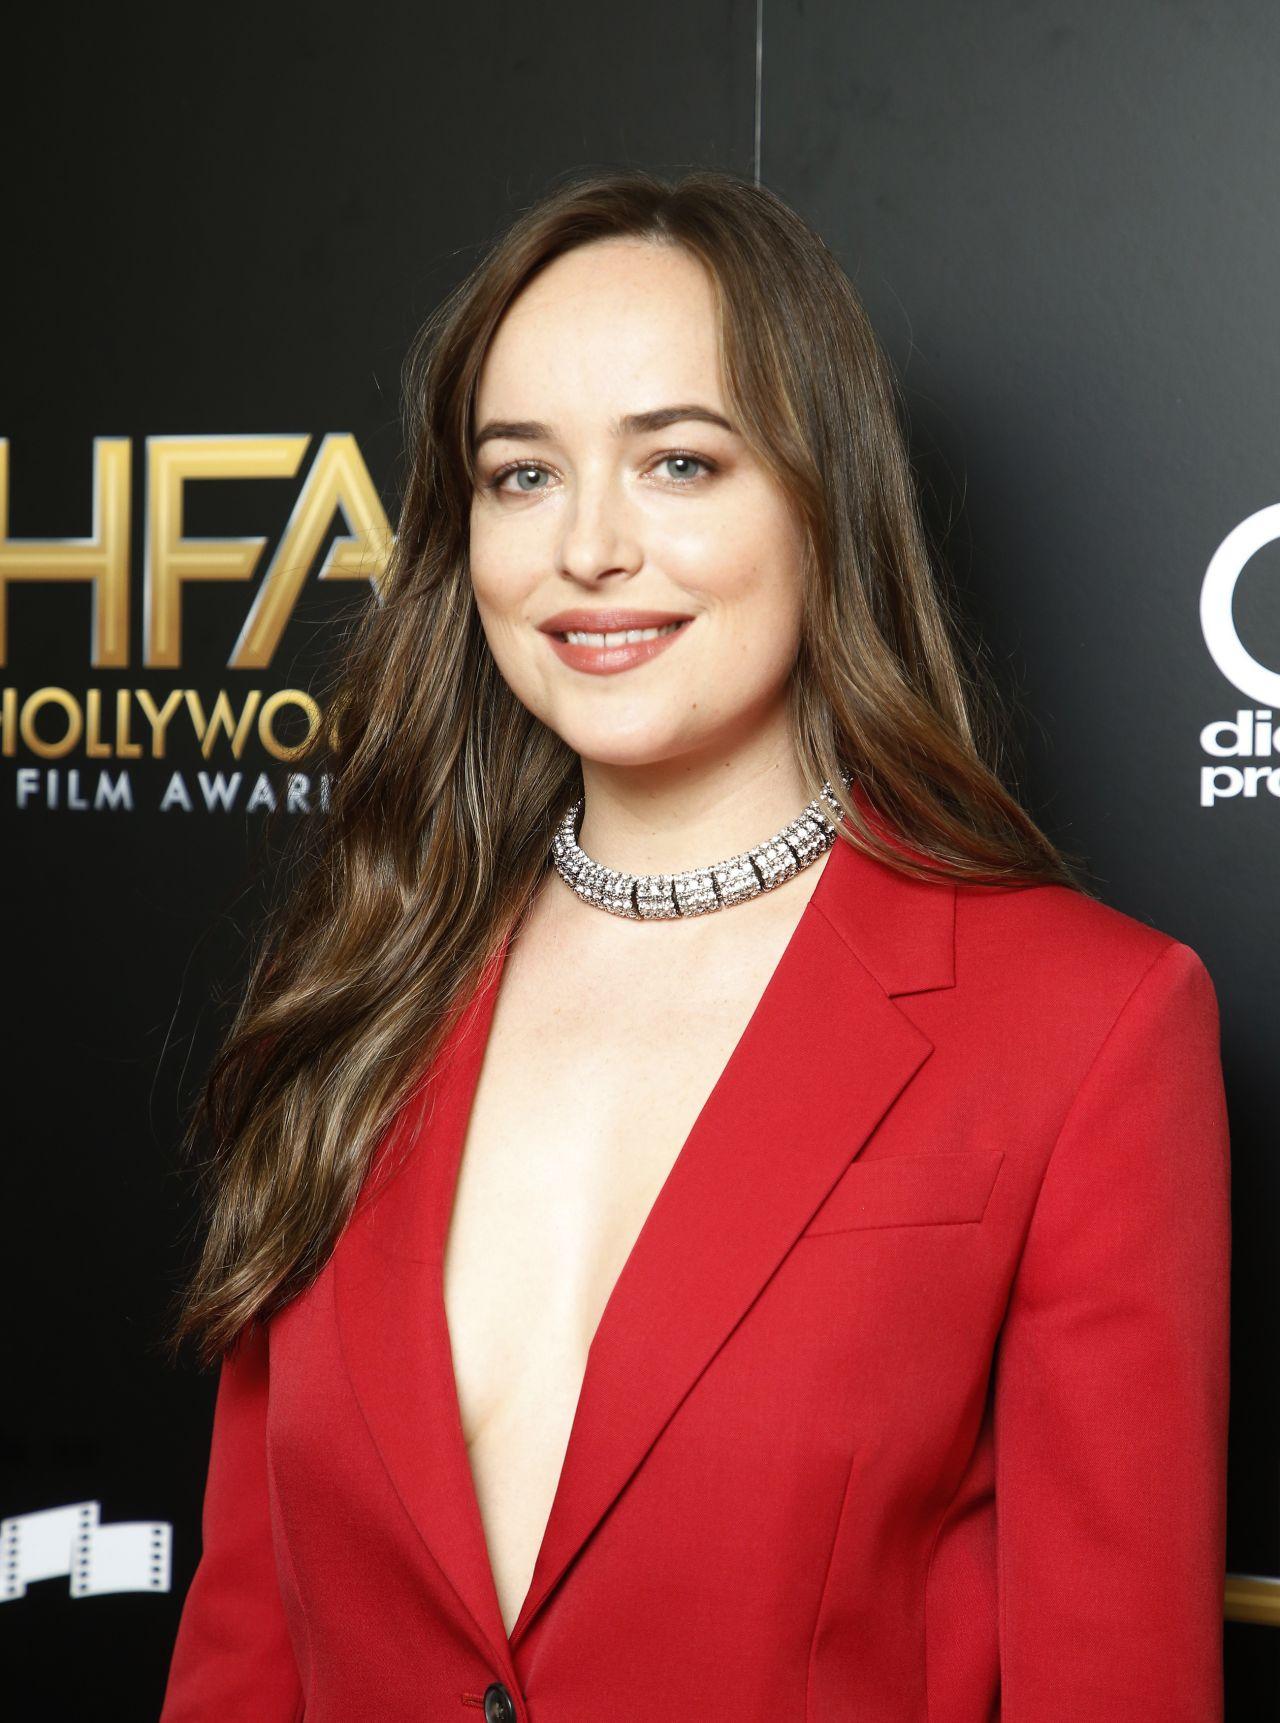 Dakota Johnson Hollywood Film Awards 2017 In Los Angeles